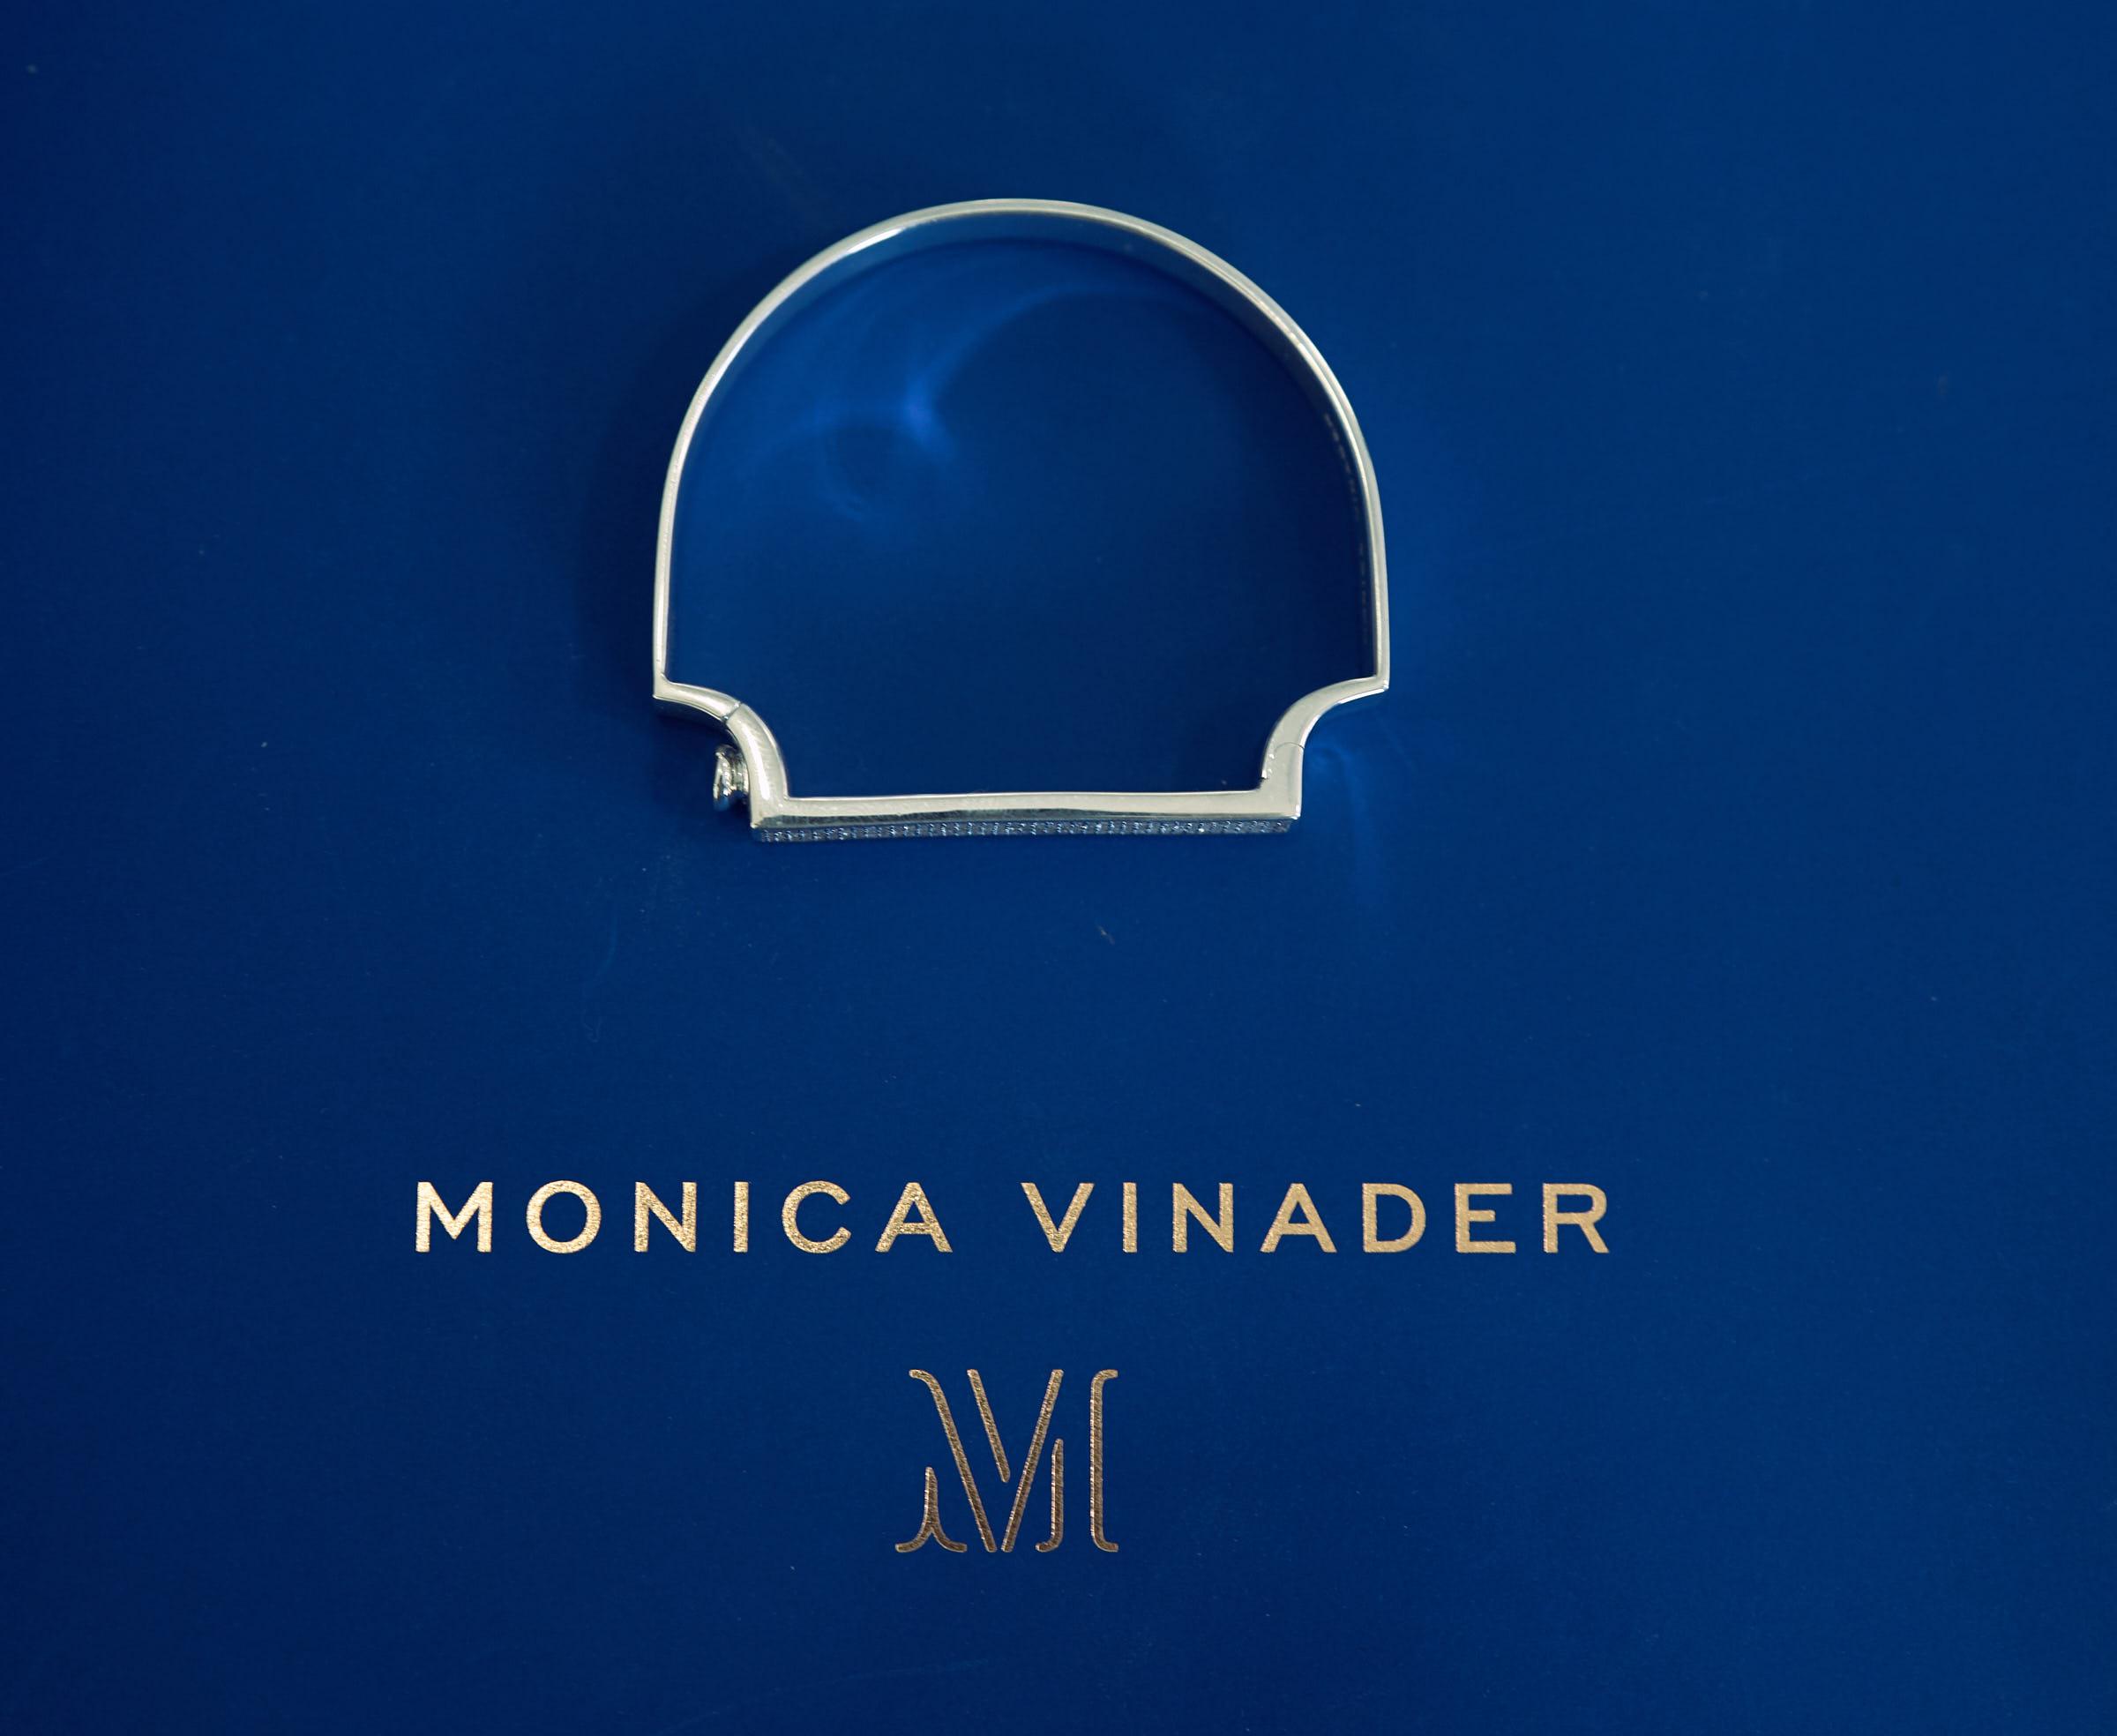 Monica Vinader Bracelet Photo By Afewgoodclicks